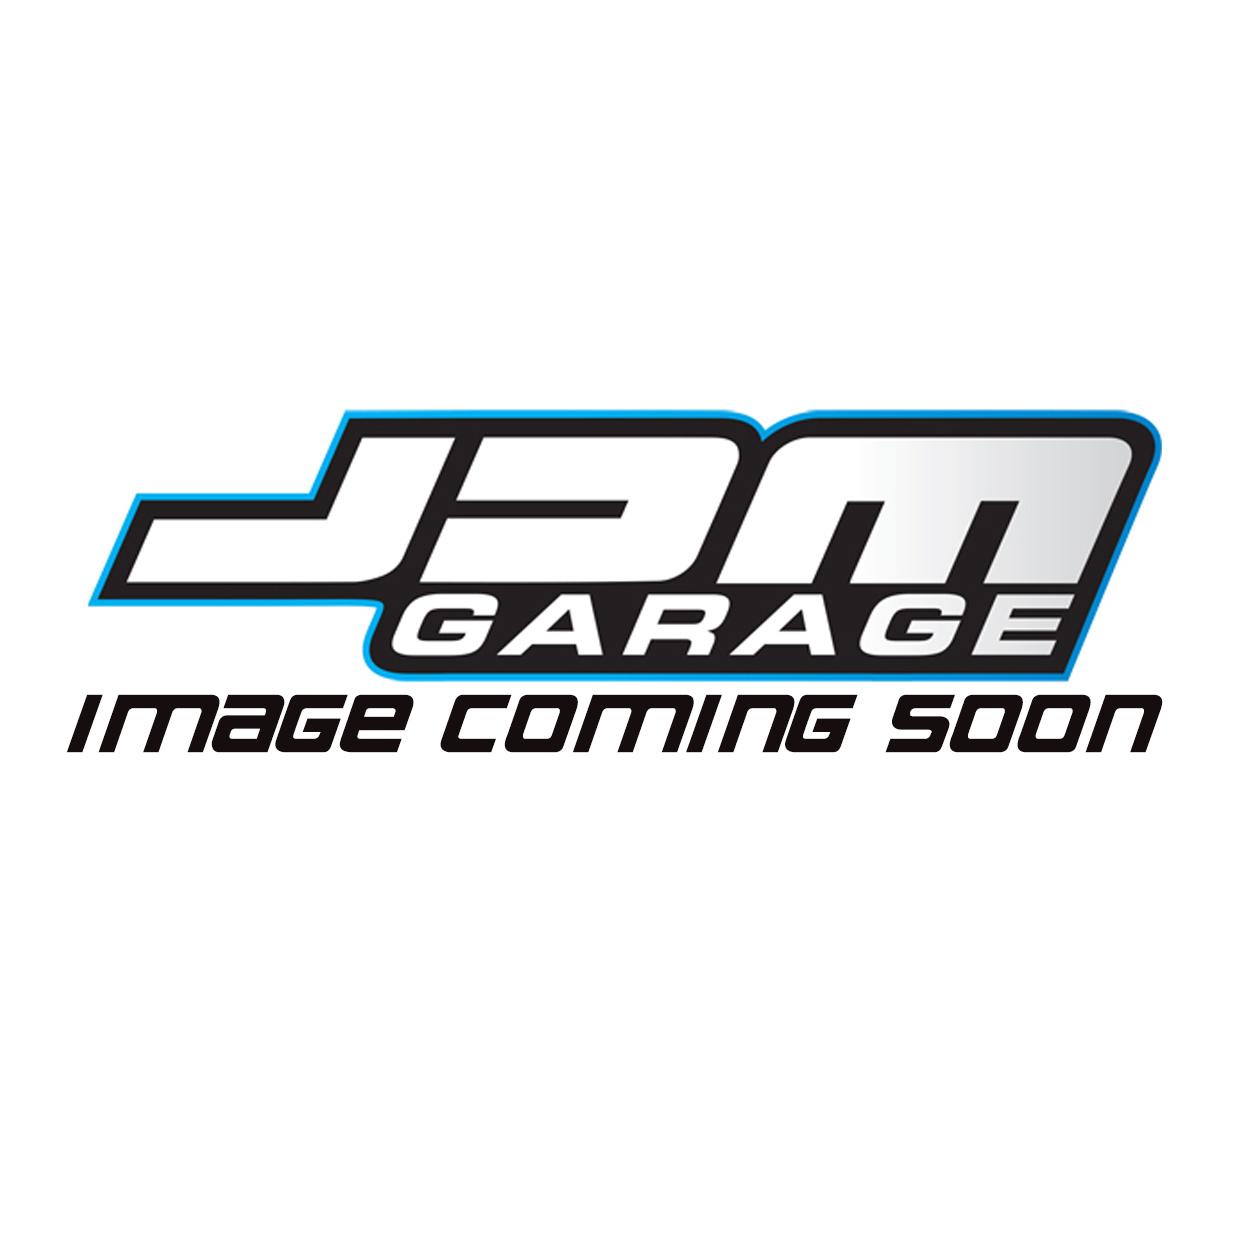 DBA 4000 Series Rear Brake Kit - T3 - For Mitsubishi Evo Evolution X 10 2008-2016